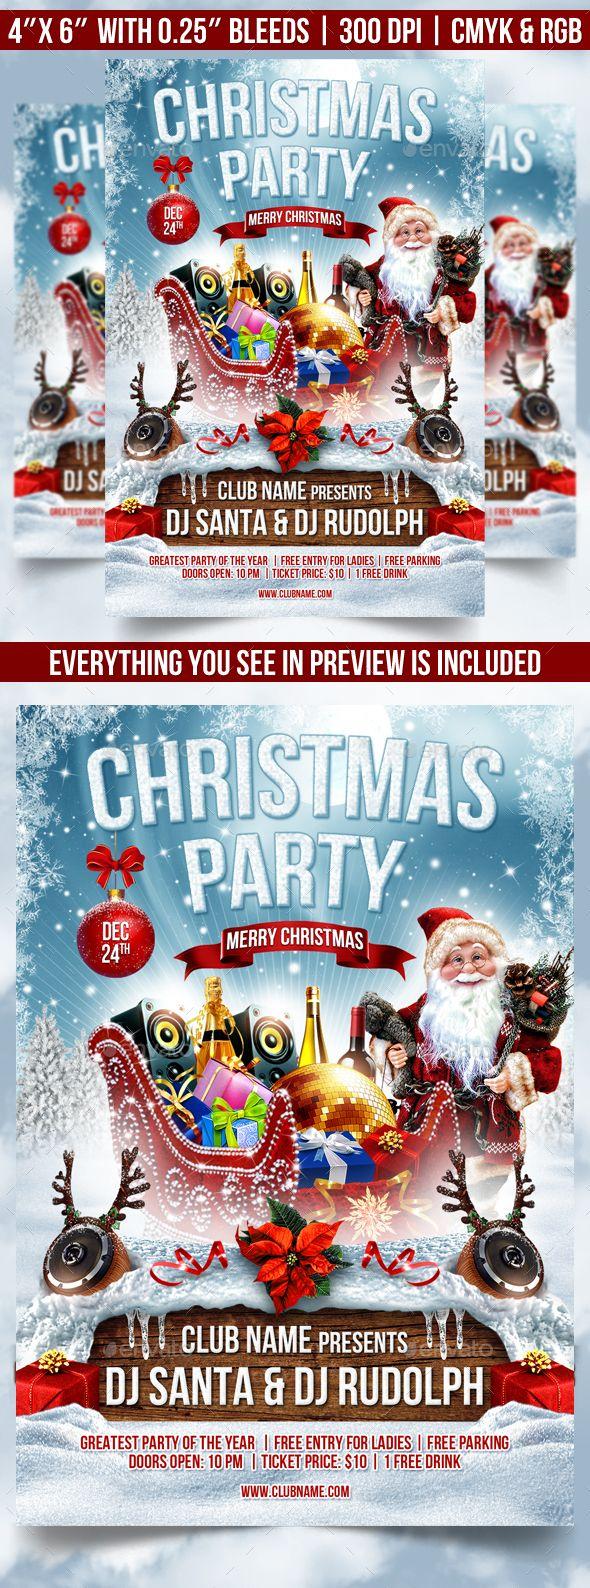 Merry Christmas Flyer Template PSD #design Download: http://graphicriver.net/item/merry-christmas-flyer-template/13641262?ref=ksioks